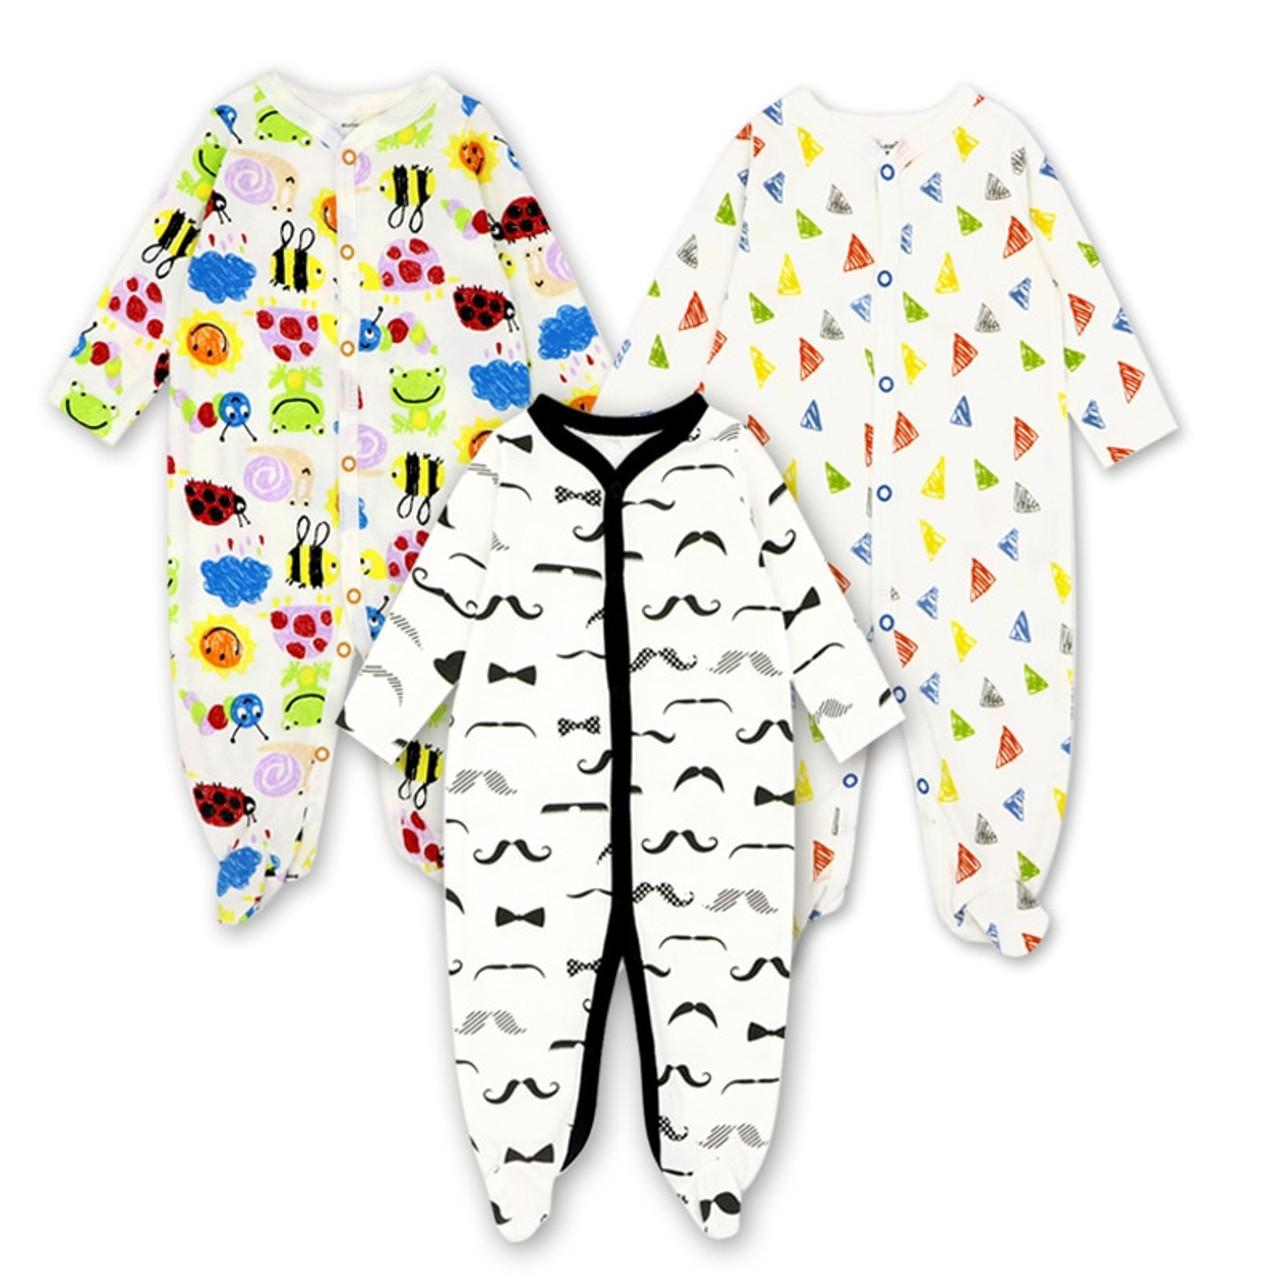 b831c27376c1a tender Babies 2/3Pcs/set Fashion Cotton baby rompers newborn girl clothes  Long Sleeve Jumpsuit roupas infantis menino Overalls